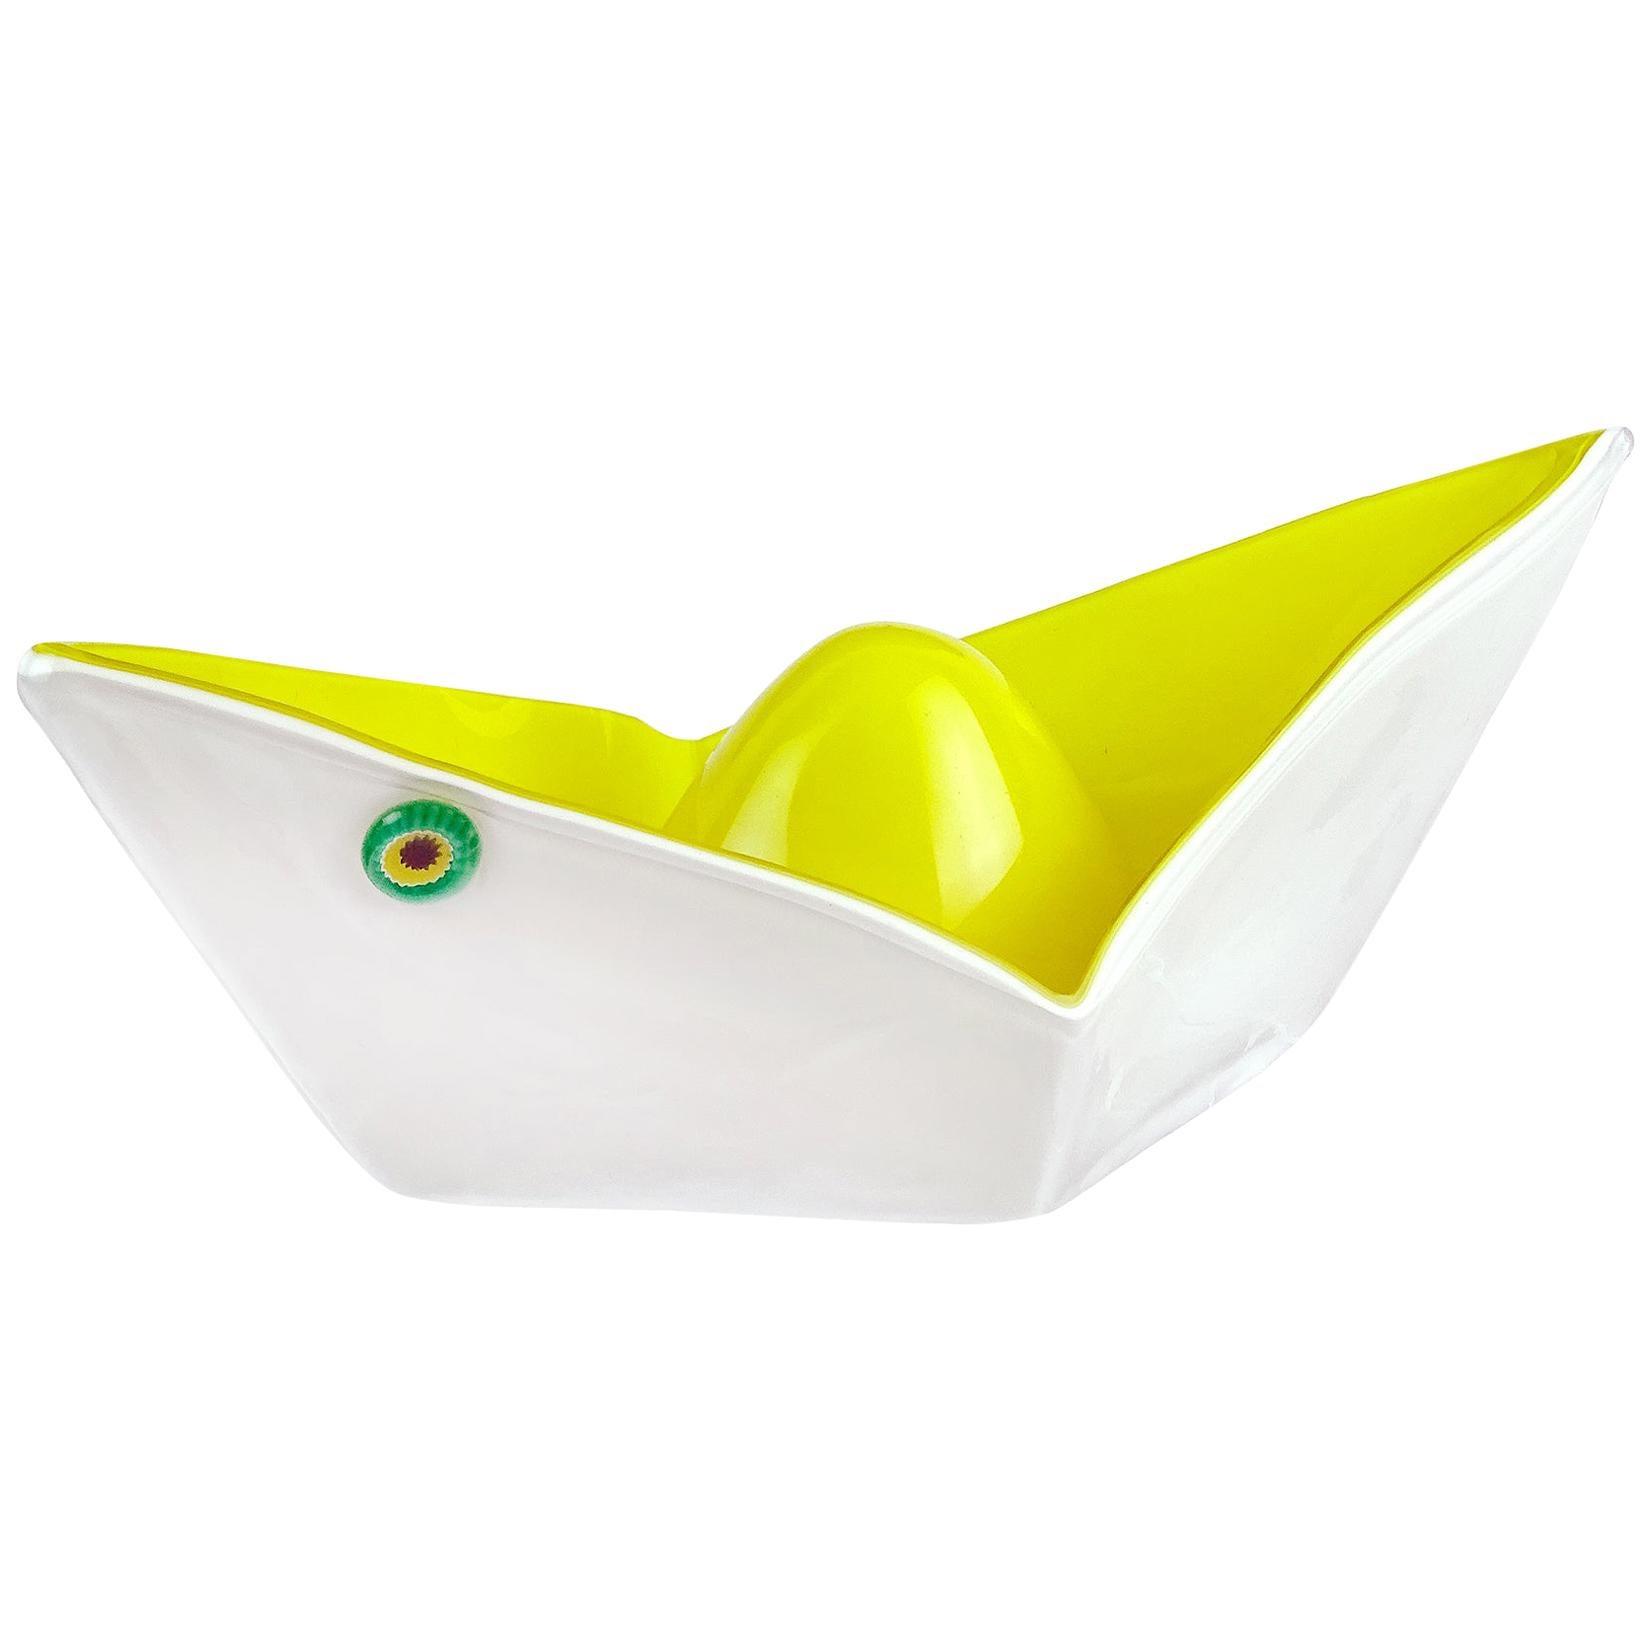 Gino Vistosi Murano 1961 Origami Paper Boat Italian Art Glass Sculptural Bowl